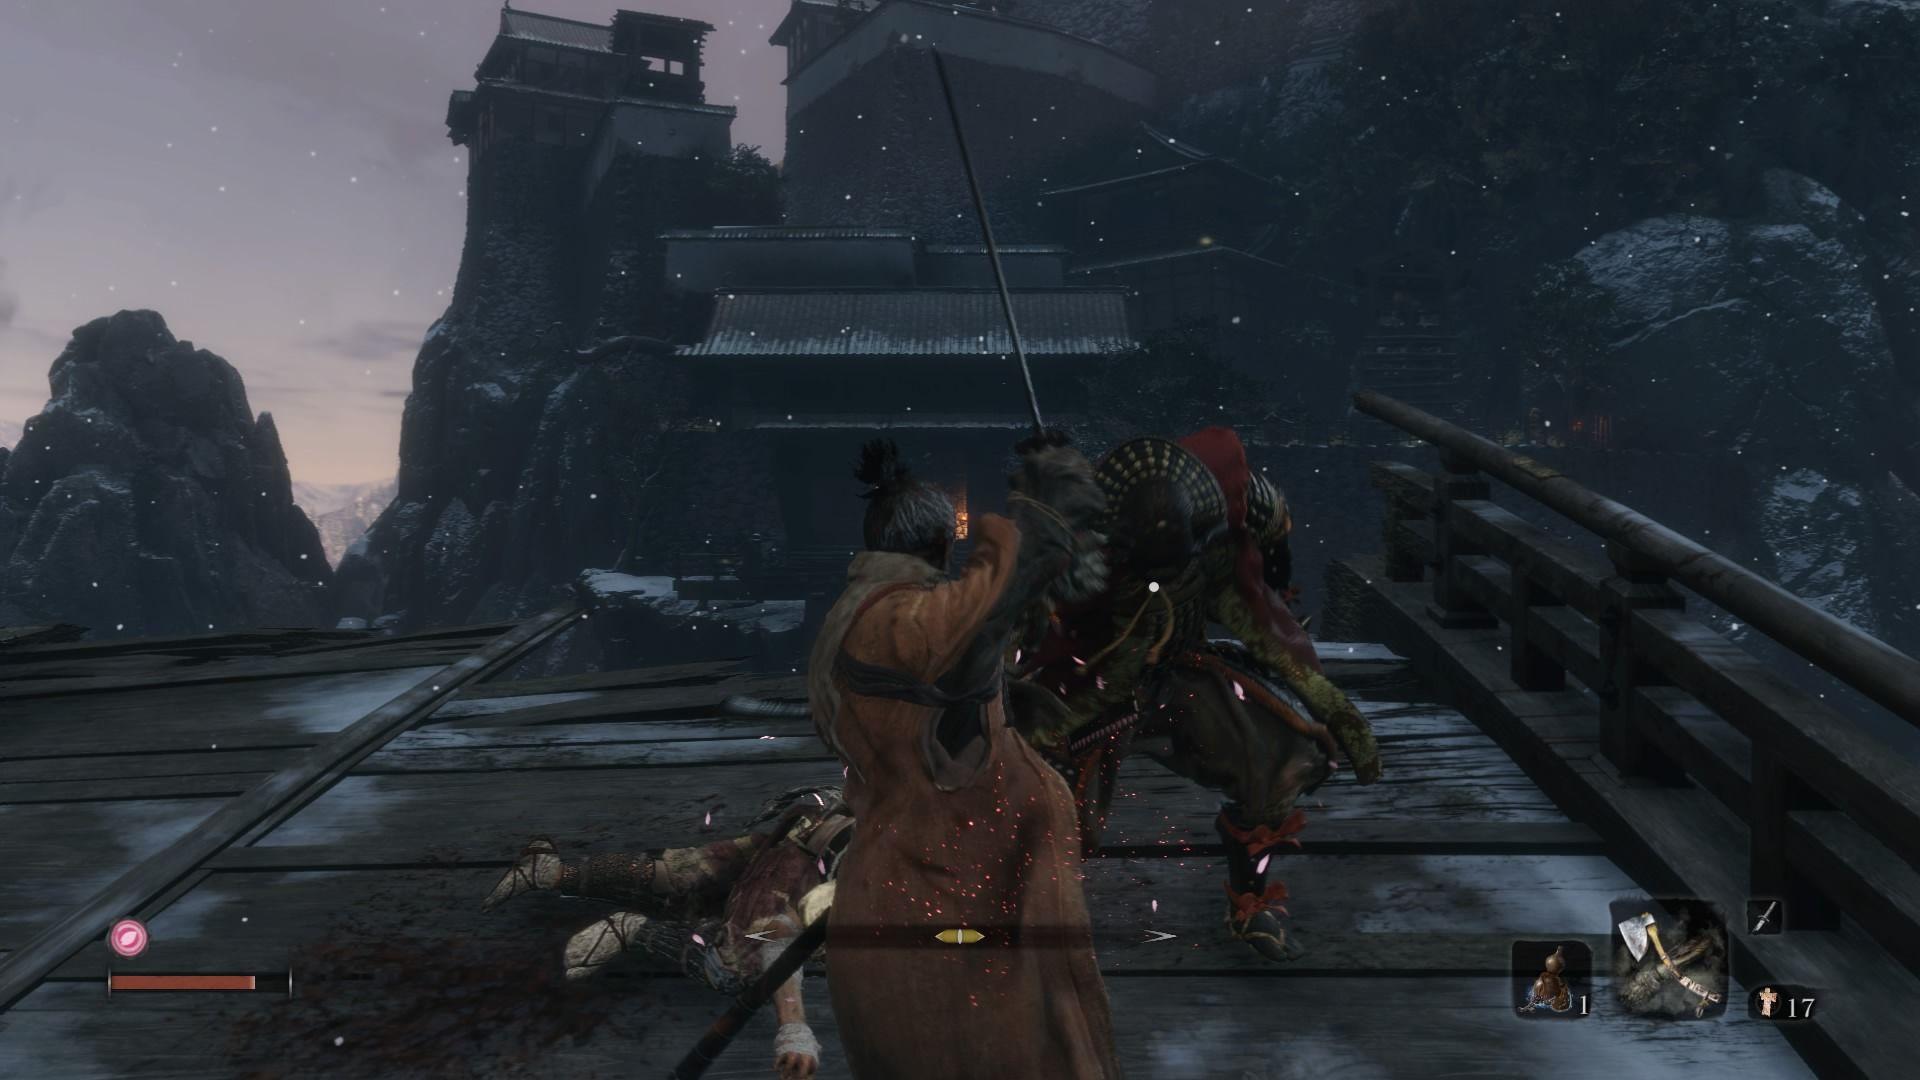 sekiro-boss-guide-general-yamauchi-shadows-die-twice-death